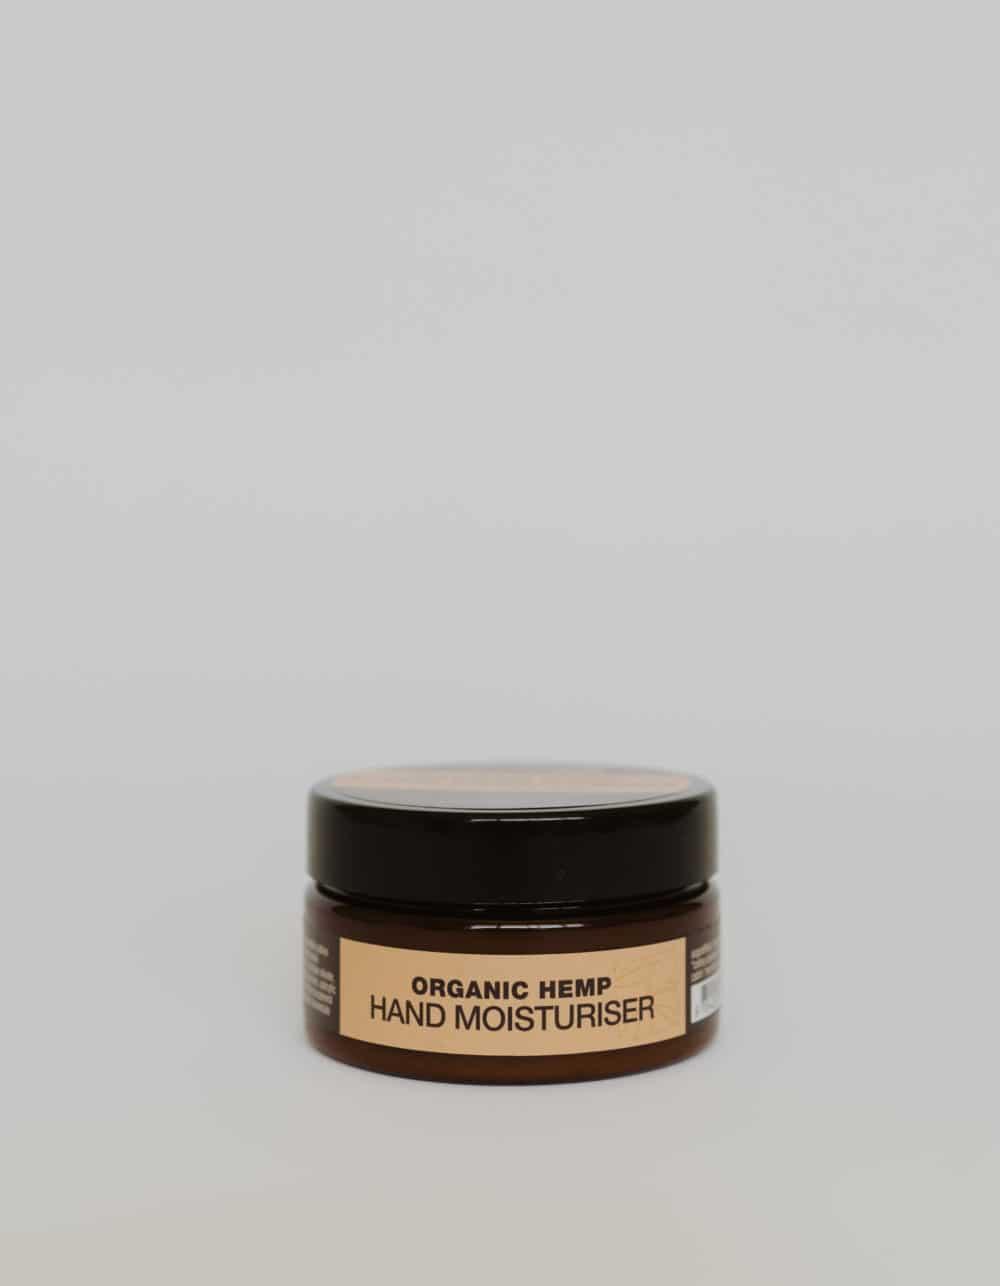 Organic Hemp Hand Moisturiser - 50g